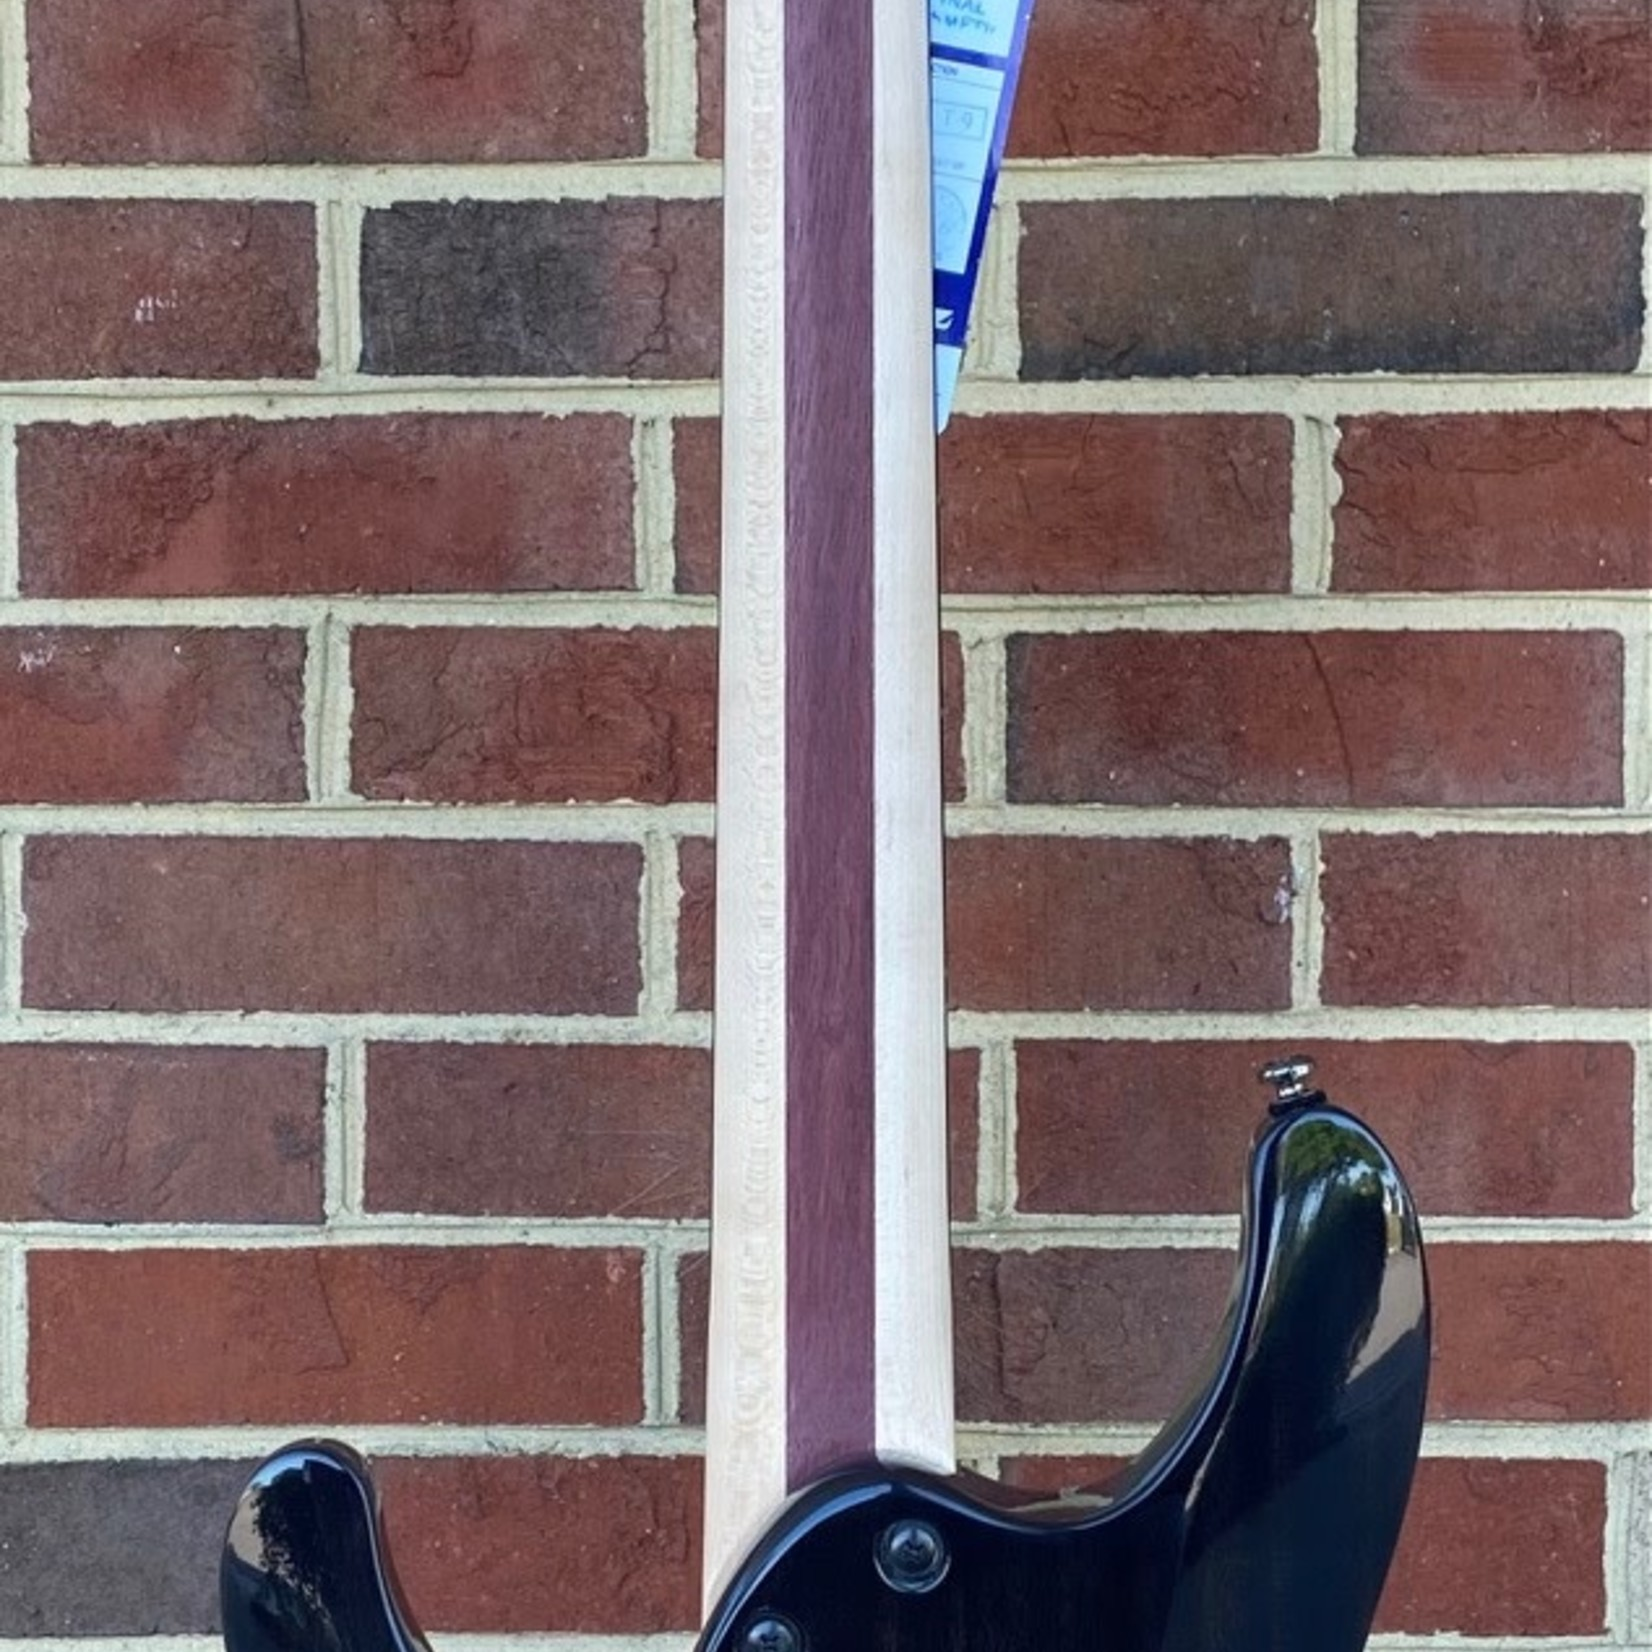 Ibanez Ibanez JIVA10DSB, Nita Strauss Signature Model, Deep Space Blonde, Quilted Maple Top, Nyatoh body, 3pc Maple/Purple Heart Nitro Wizard neck, Ebony FB, Dimarzio Pandemonium Humbuckers, Dimarzio True Velvet Single Coil